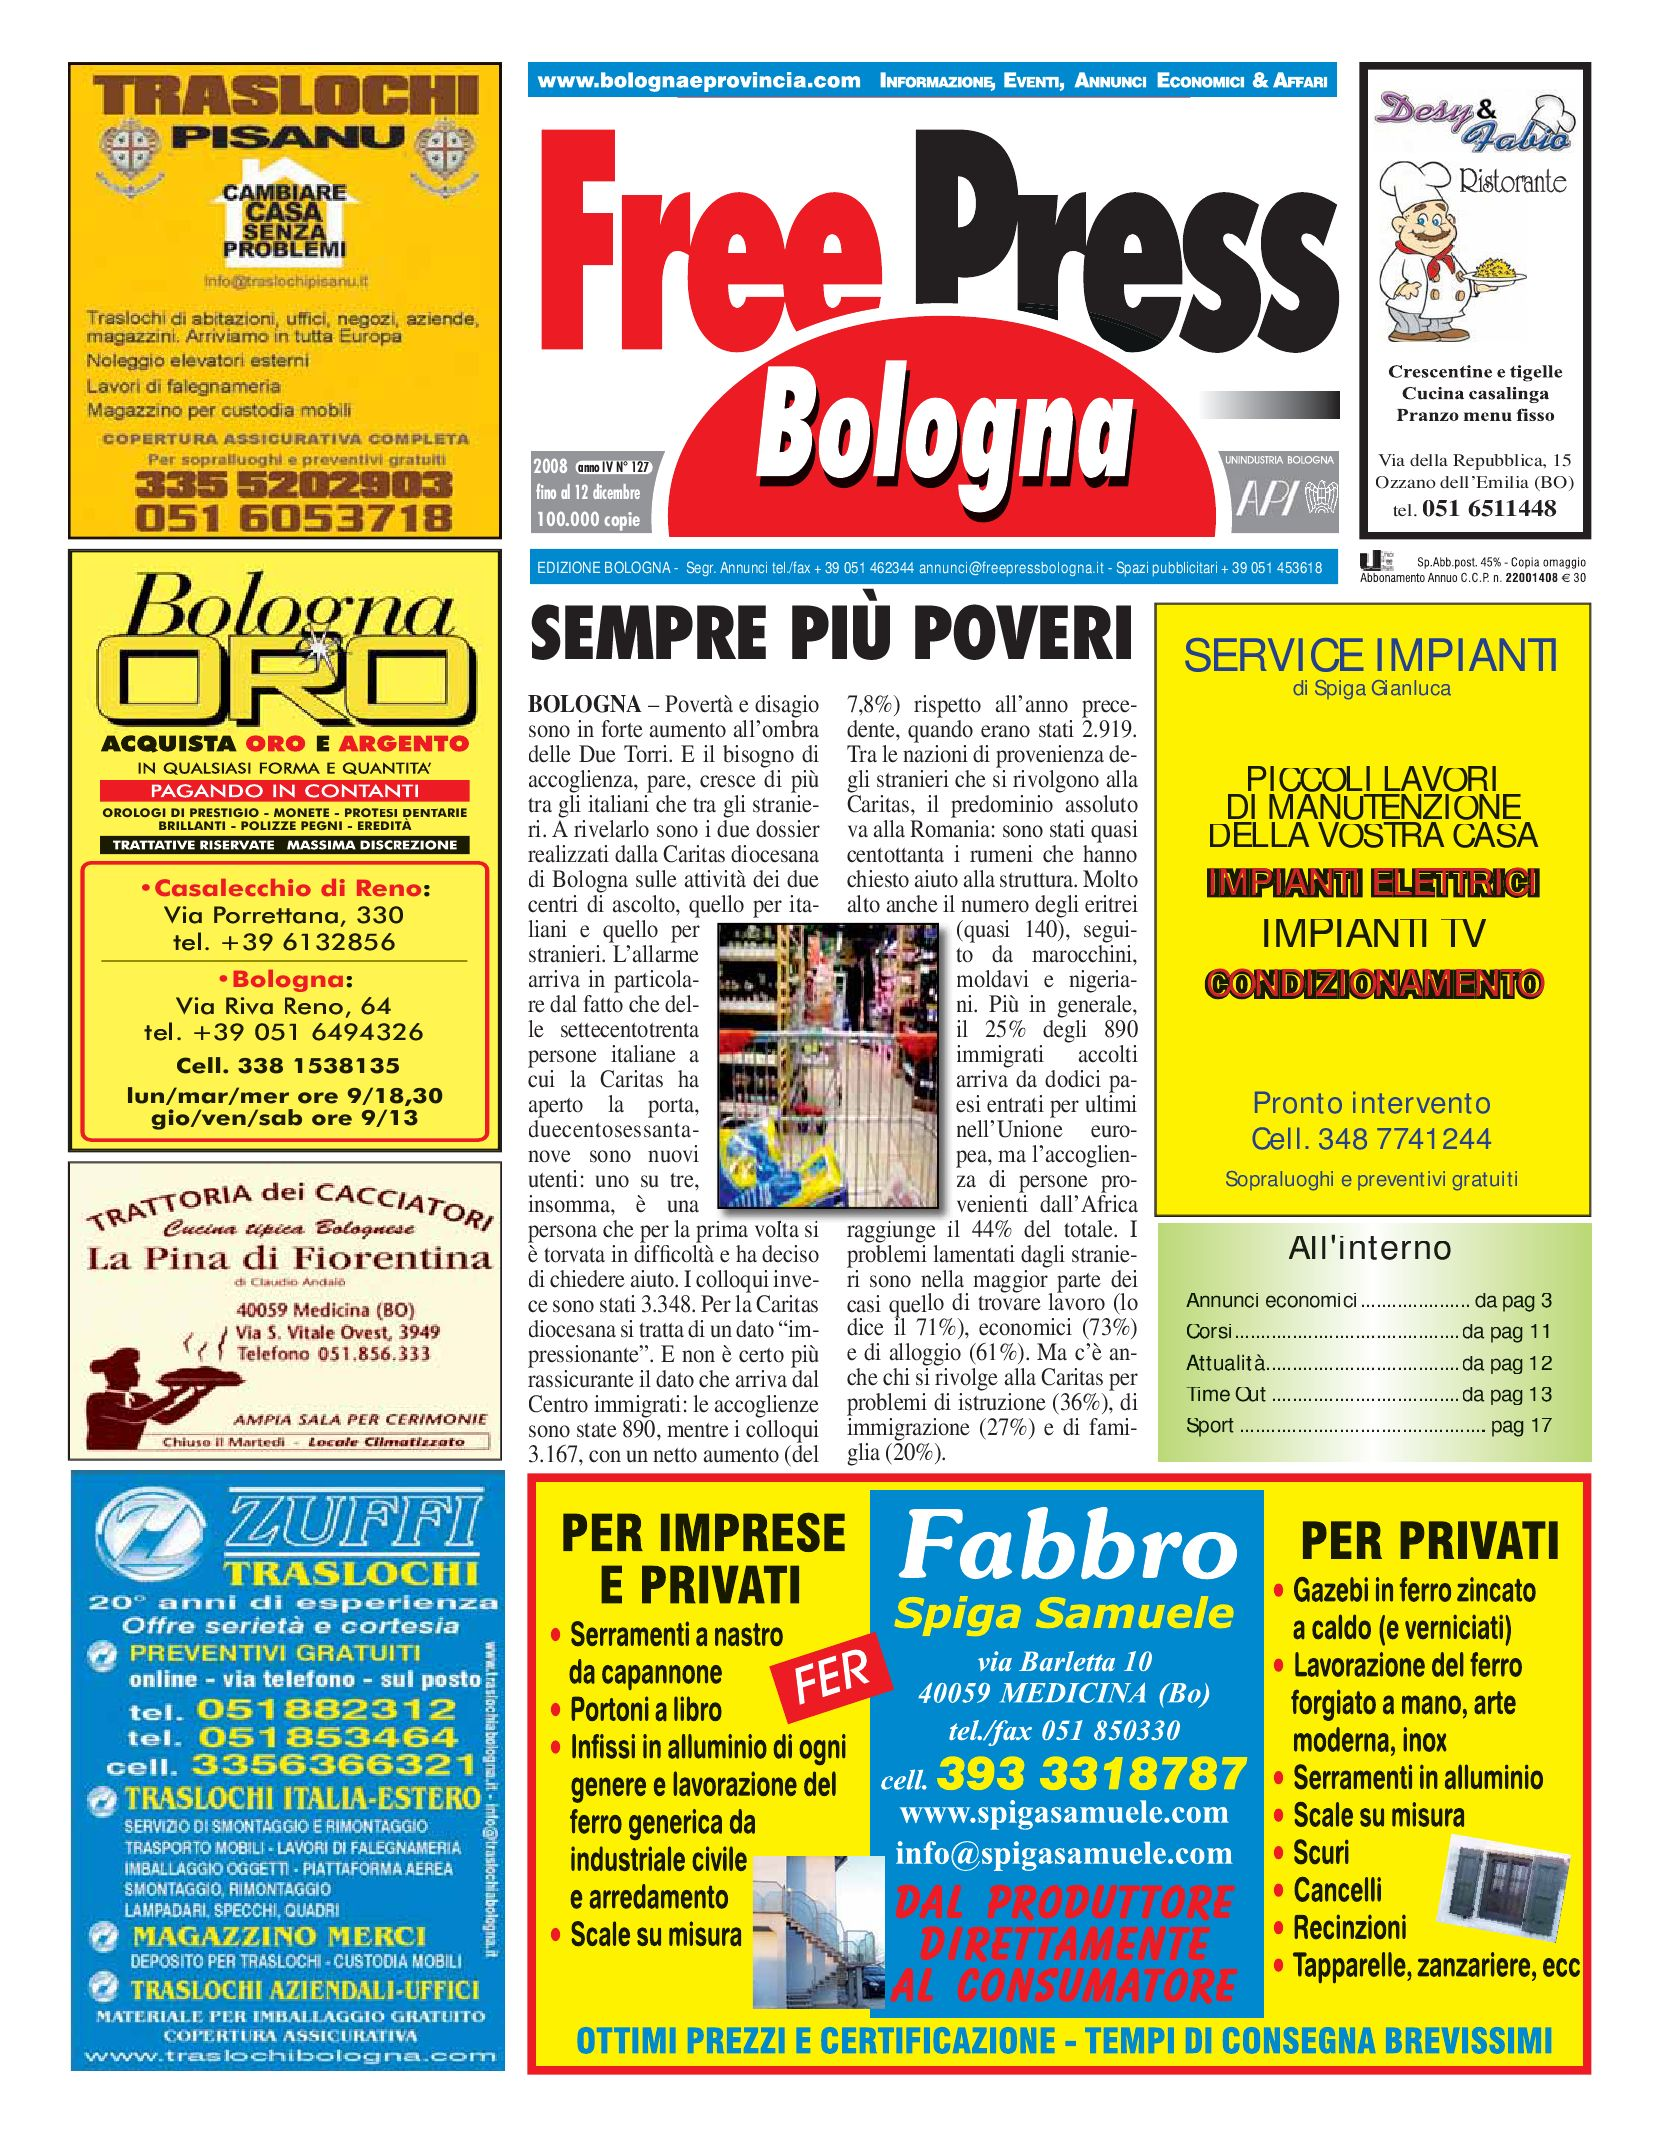 scarpe calcio in Sessa Aurunca for €120.00 for sale | Shpock